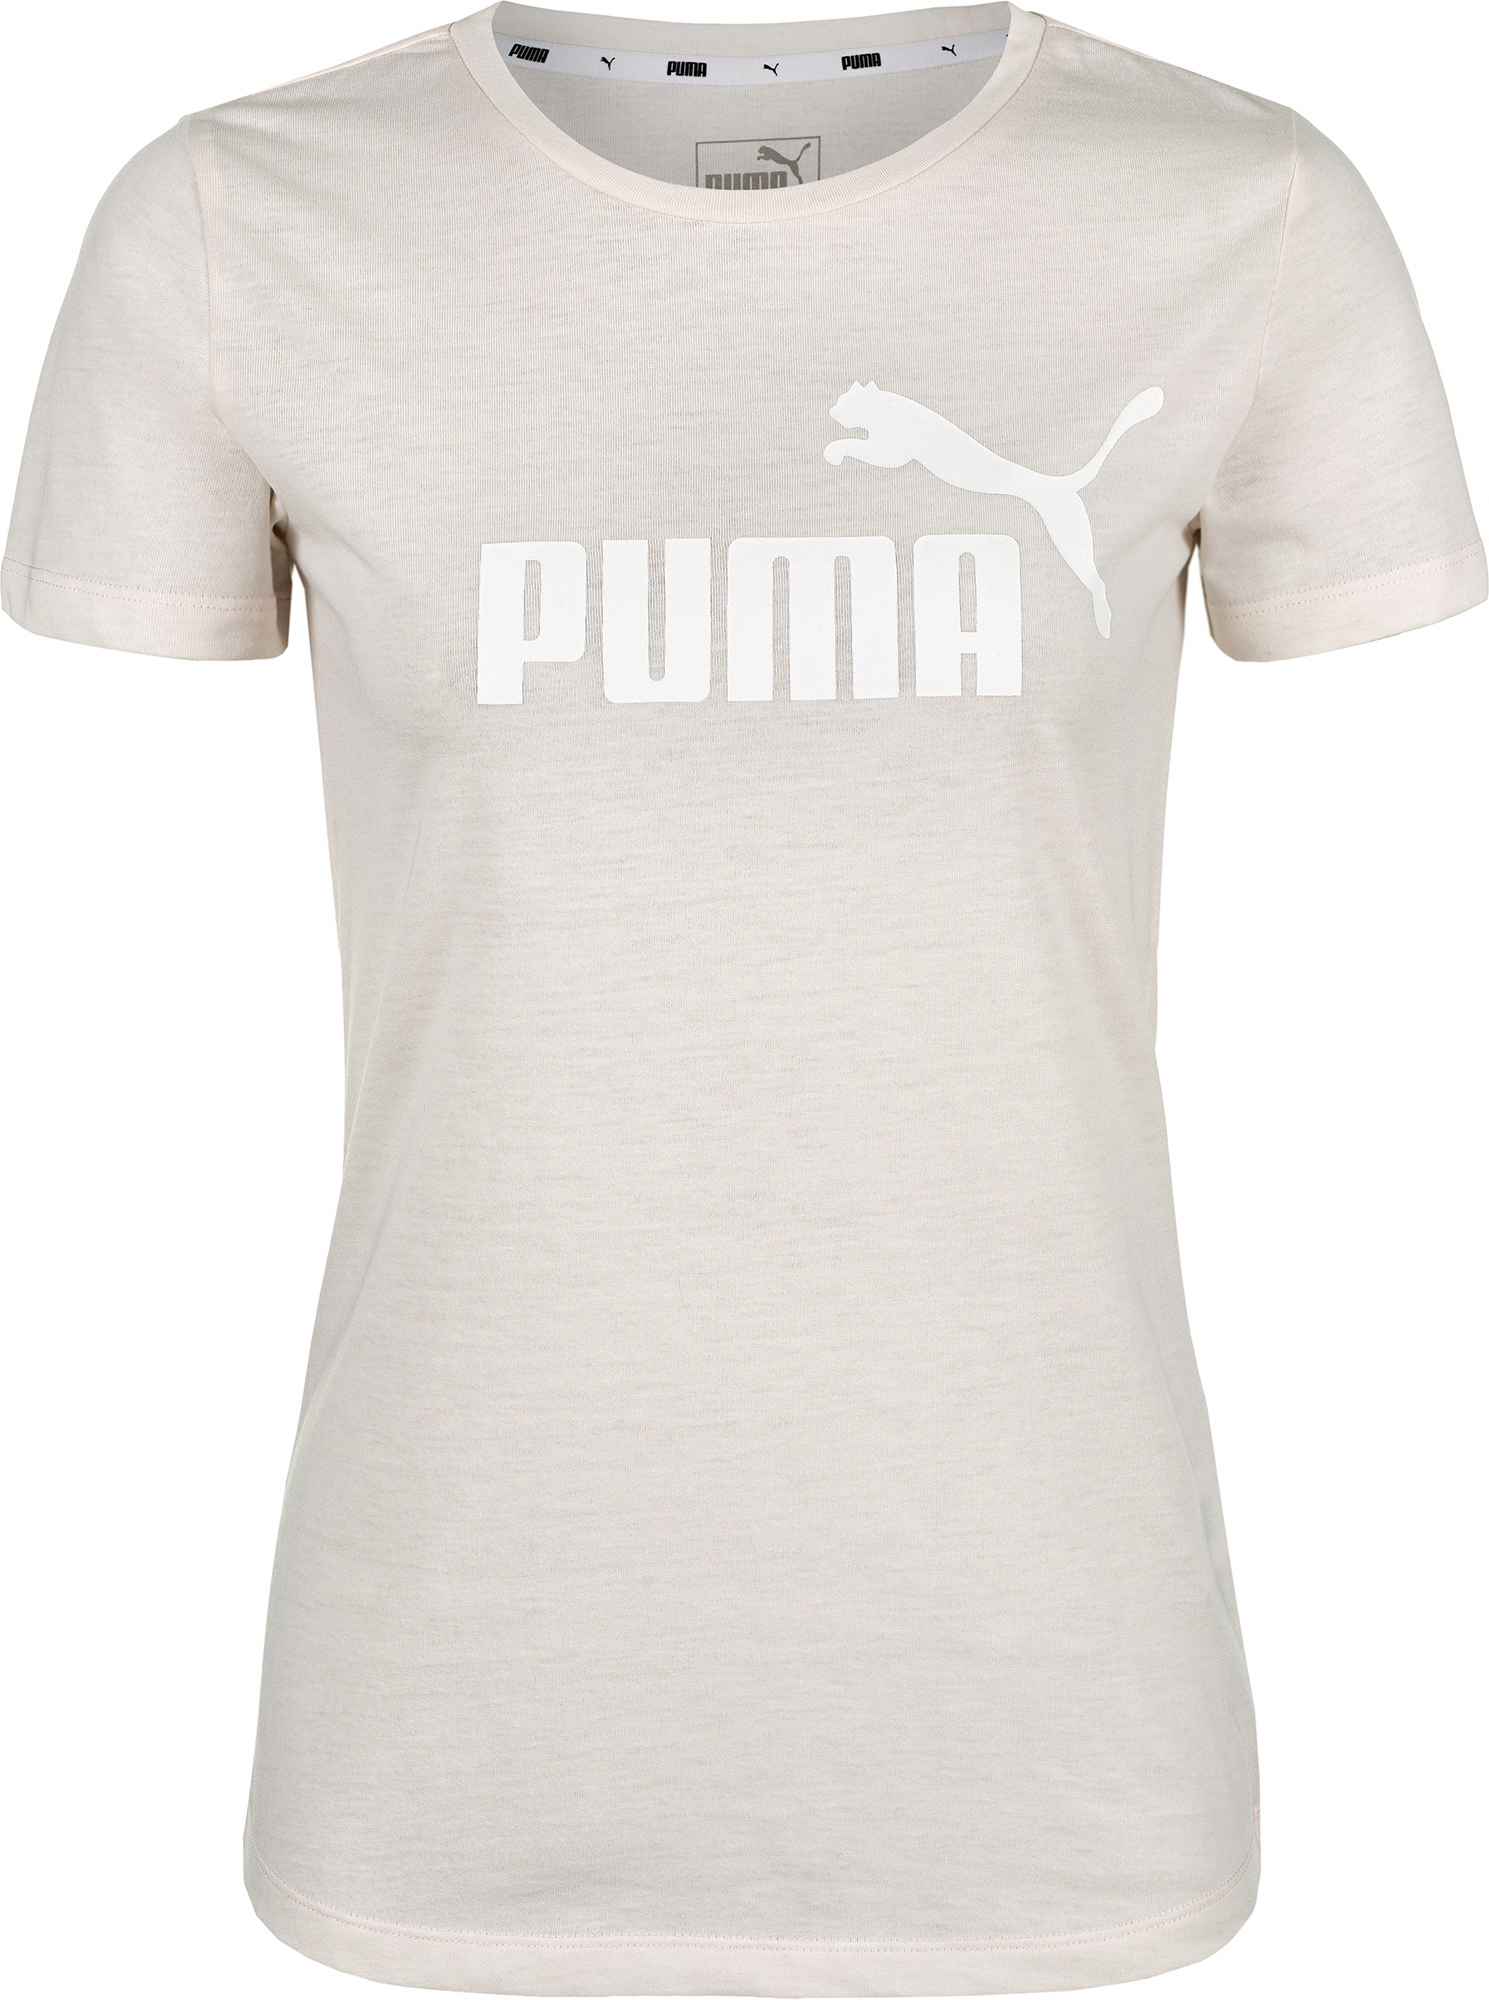 Puma Футболка женская Puma ESS+ Logo Heather Tee, размер 46-48 men ombre tee with drawstring shorts